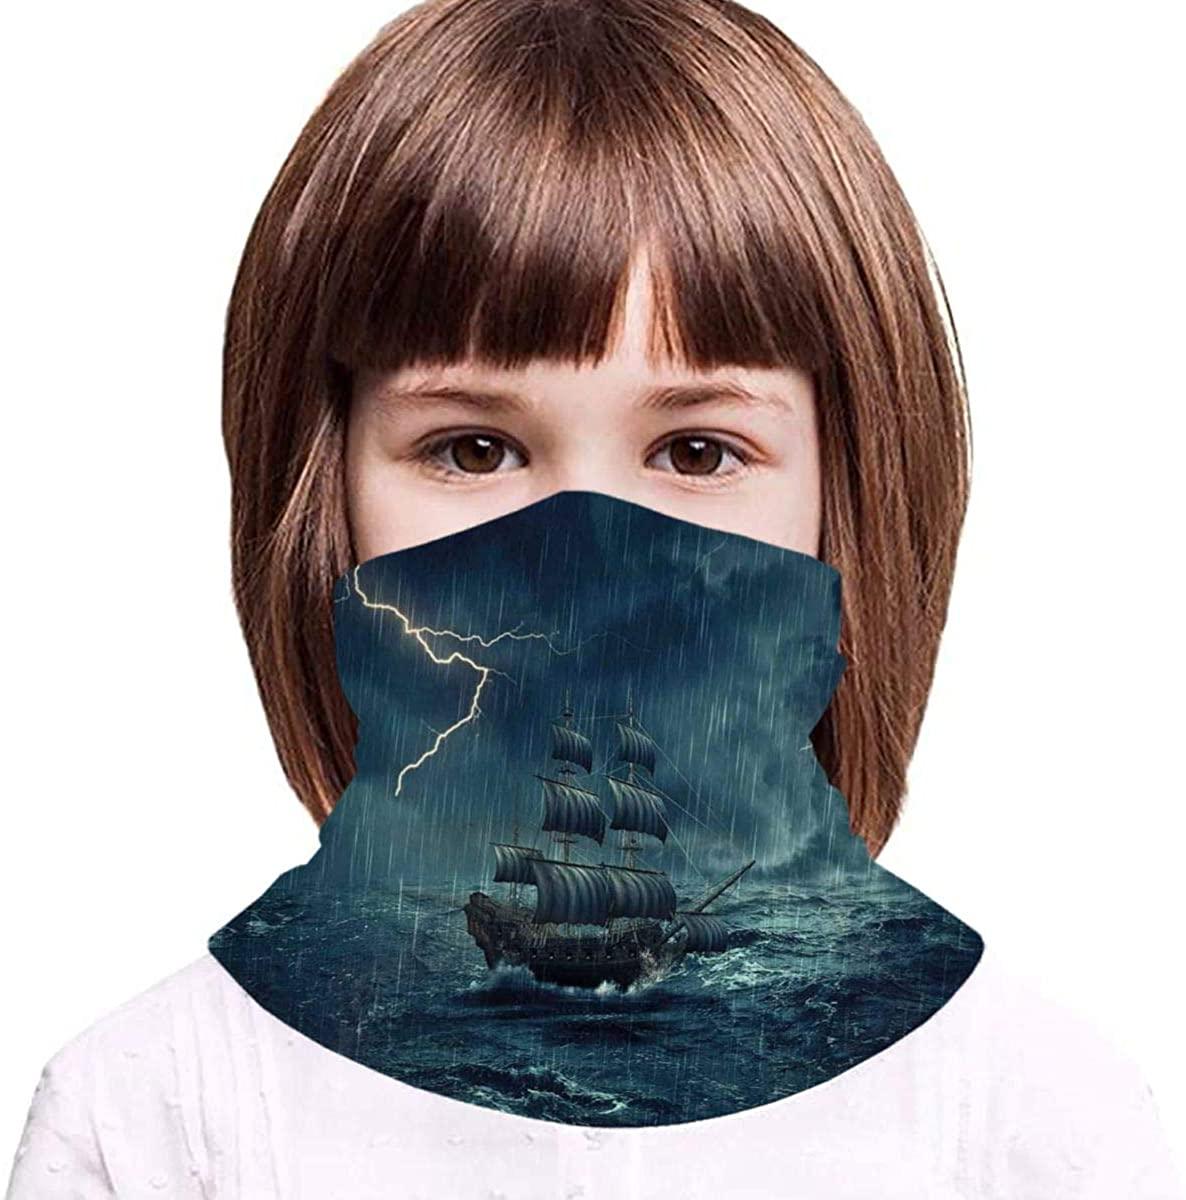 Stormy and Rainy Weather Waves Vintage Neck Gaiter Face Mask Bandana Dust Wind Sun UV Balaclava for Teen Boy Girl Outdoors